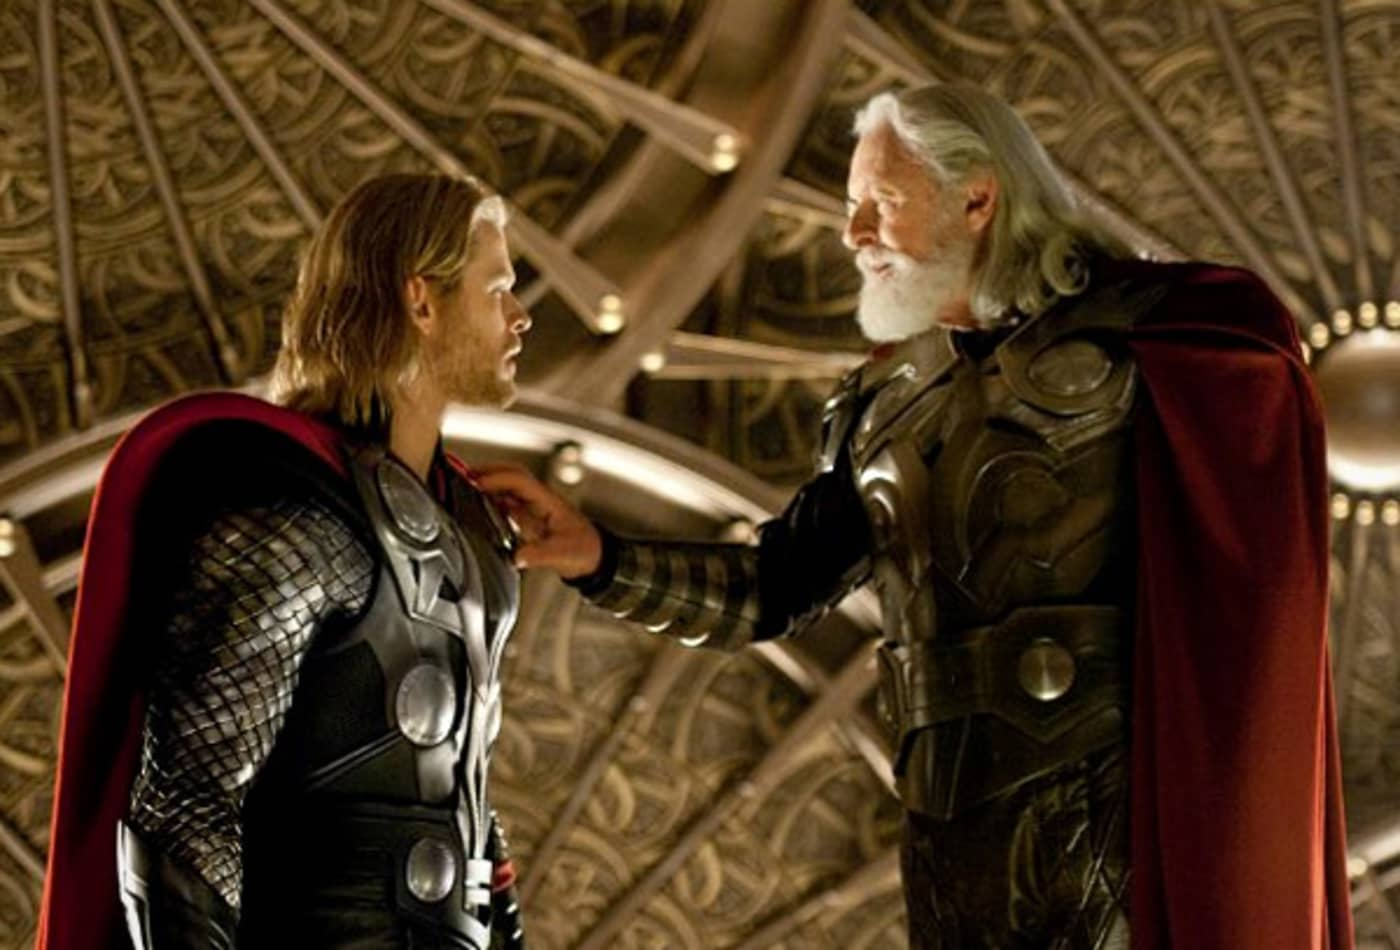 Thor-Highest-Grossing-Fantasy-Movies-CNBC.jpg